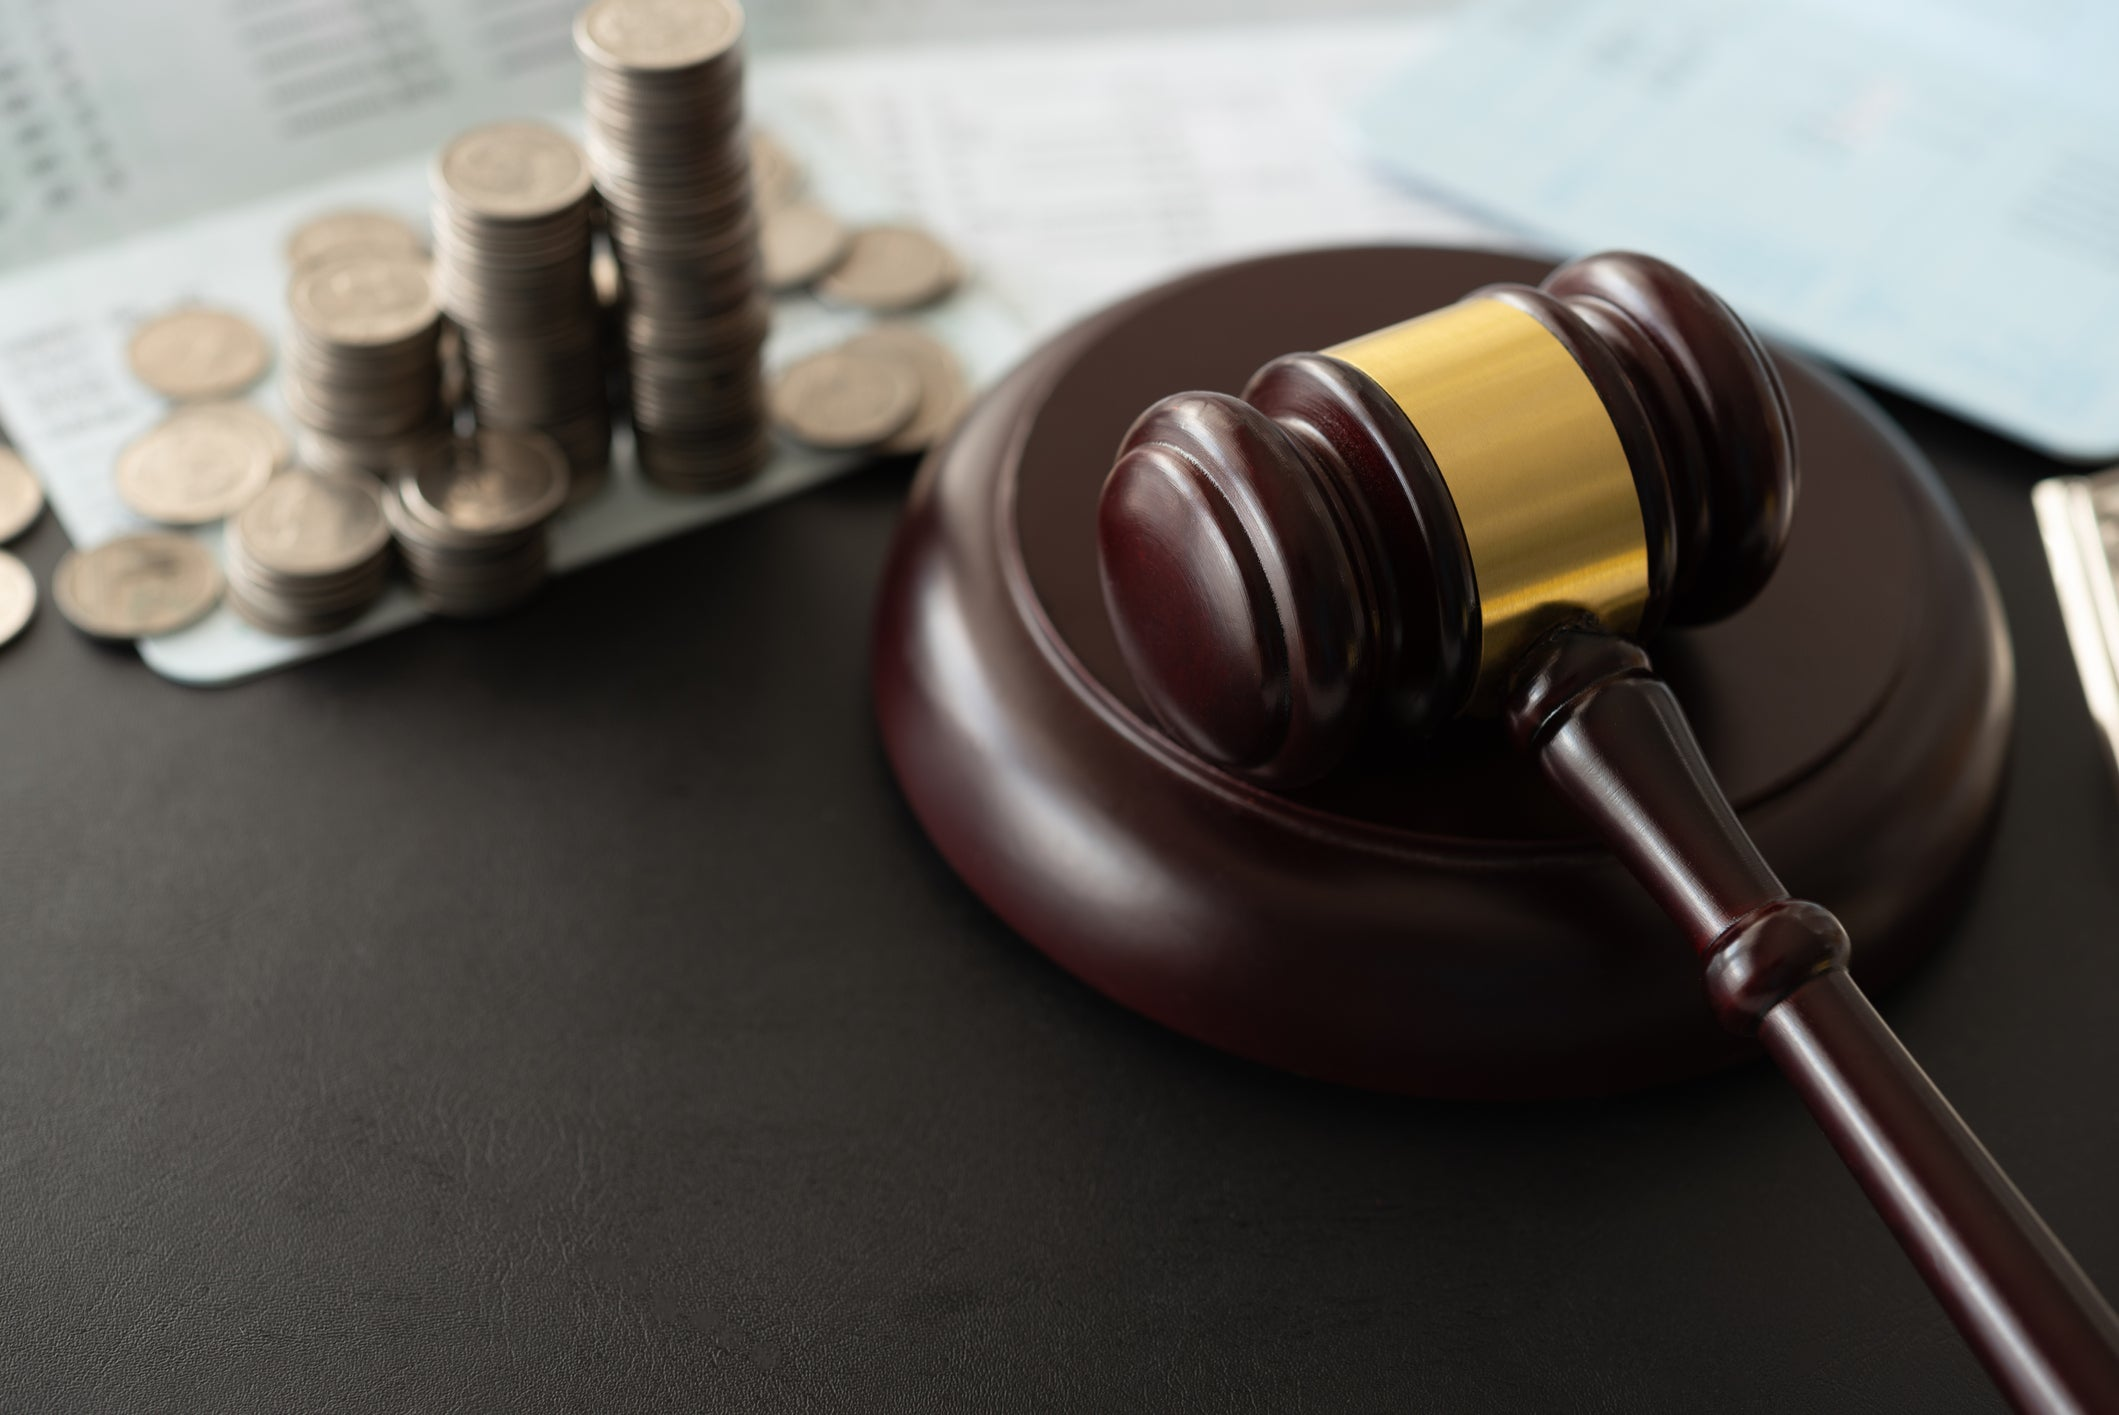 Better Buy: Bank of America vs. Wells Fargo | The Motley Fool